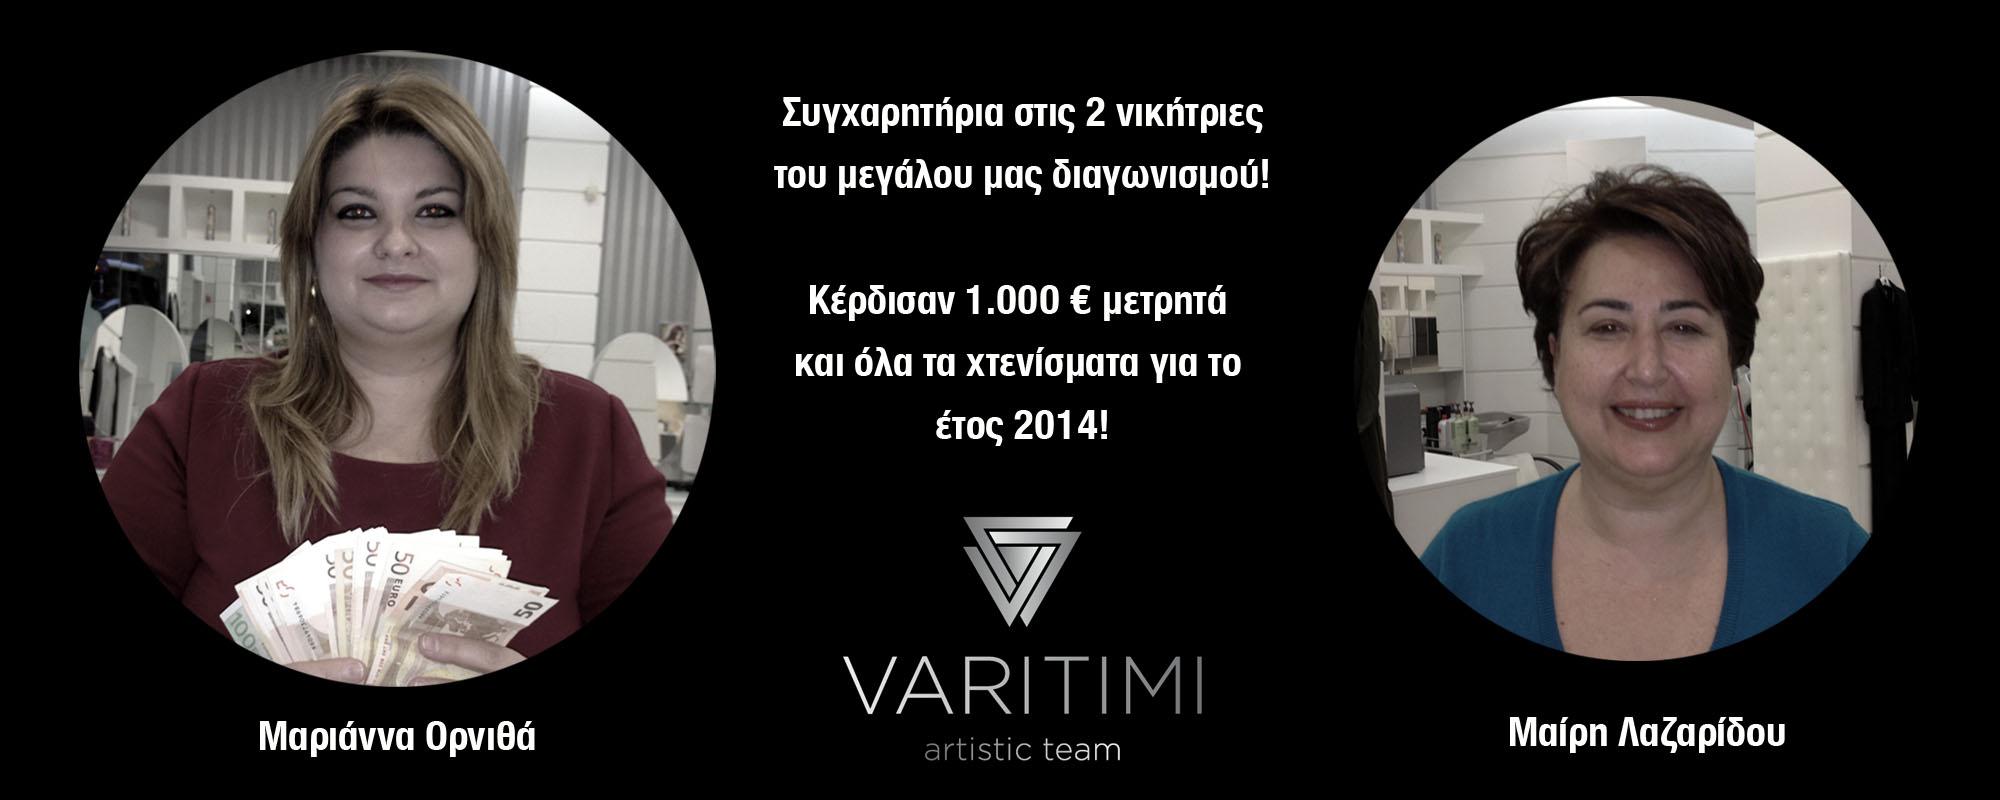 Varitimi-winners